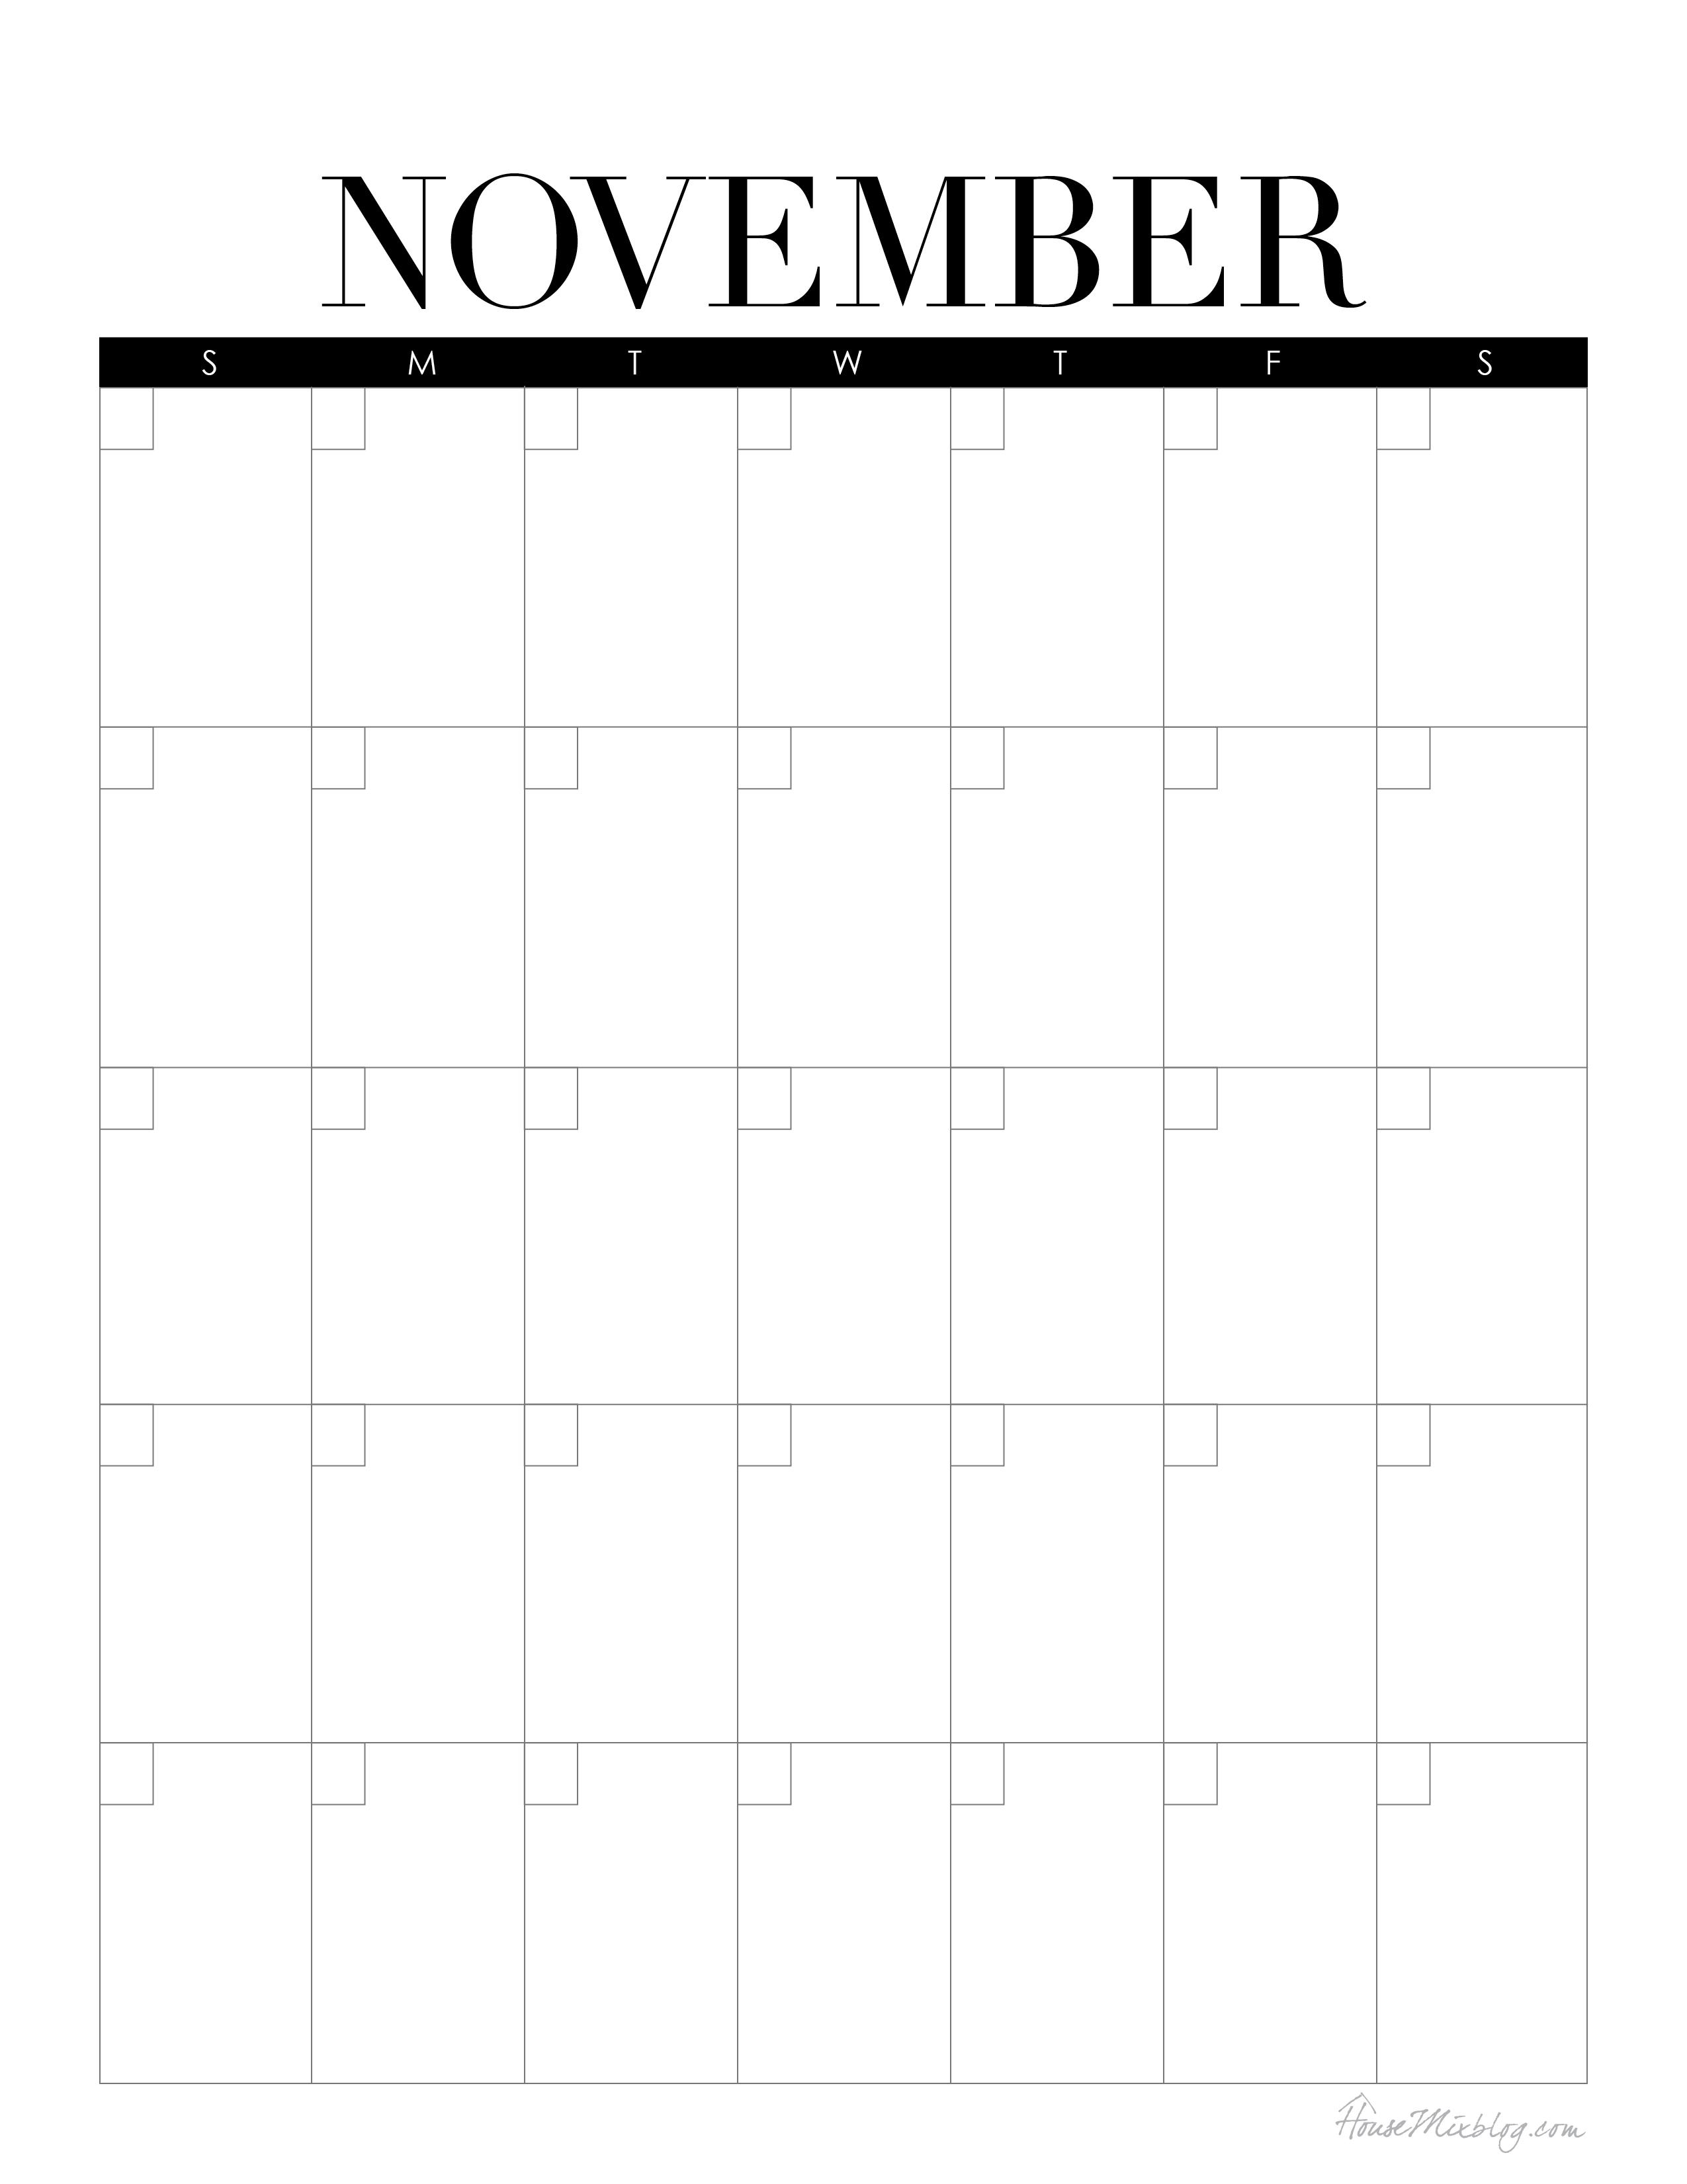 Blank Calendar November : House mix offbeat ideas on family decor and organizing